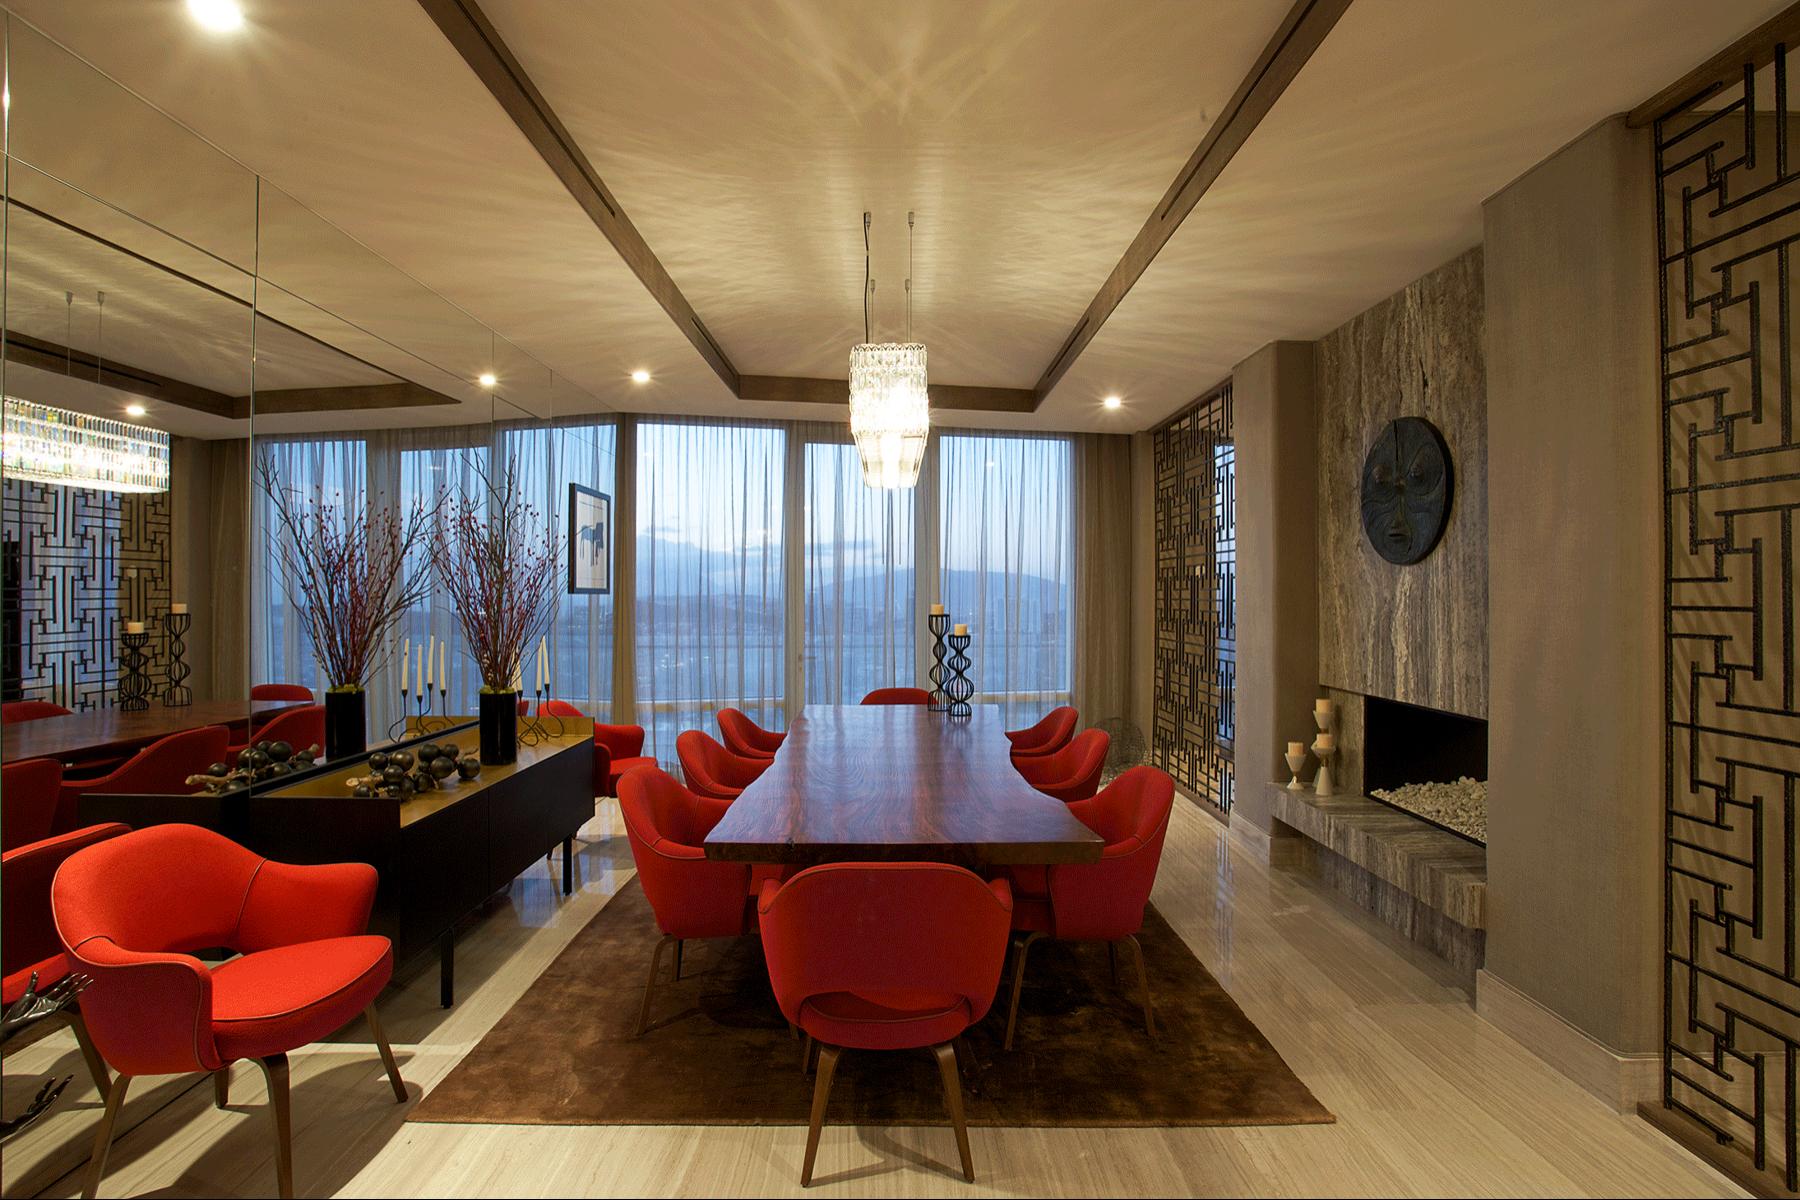 Additional photo for property listing at Exclusivo Departamento S-2203 Monterrey Monterrey, Nuevo Leon 66270 Mexico